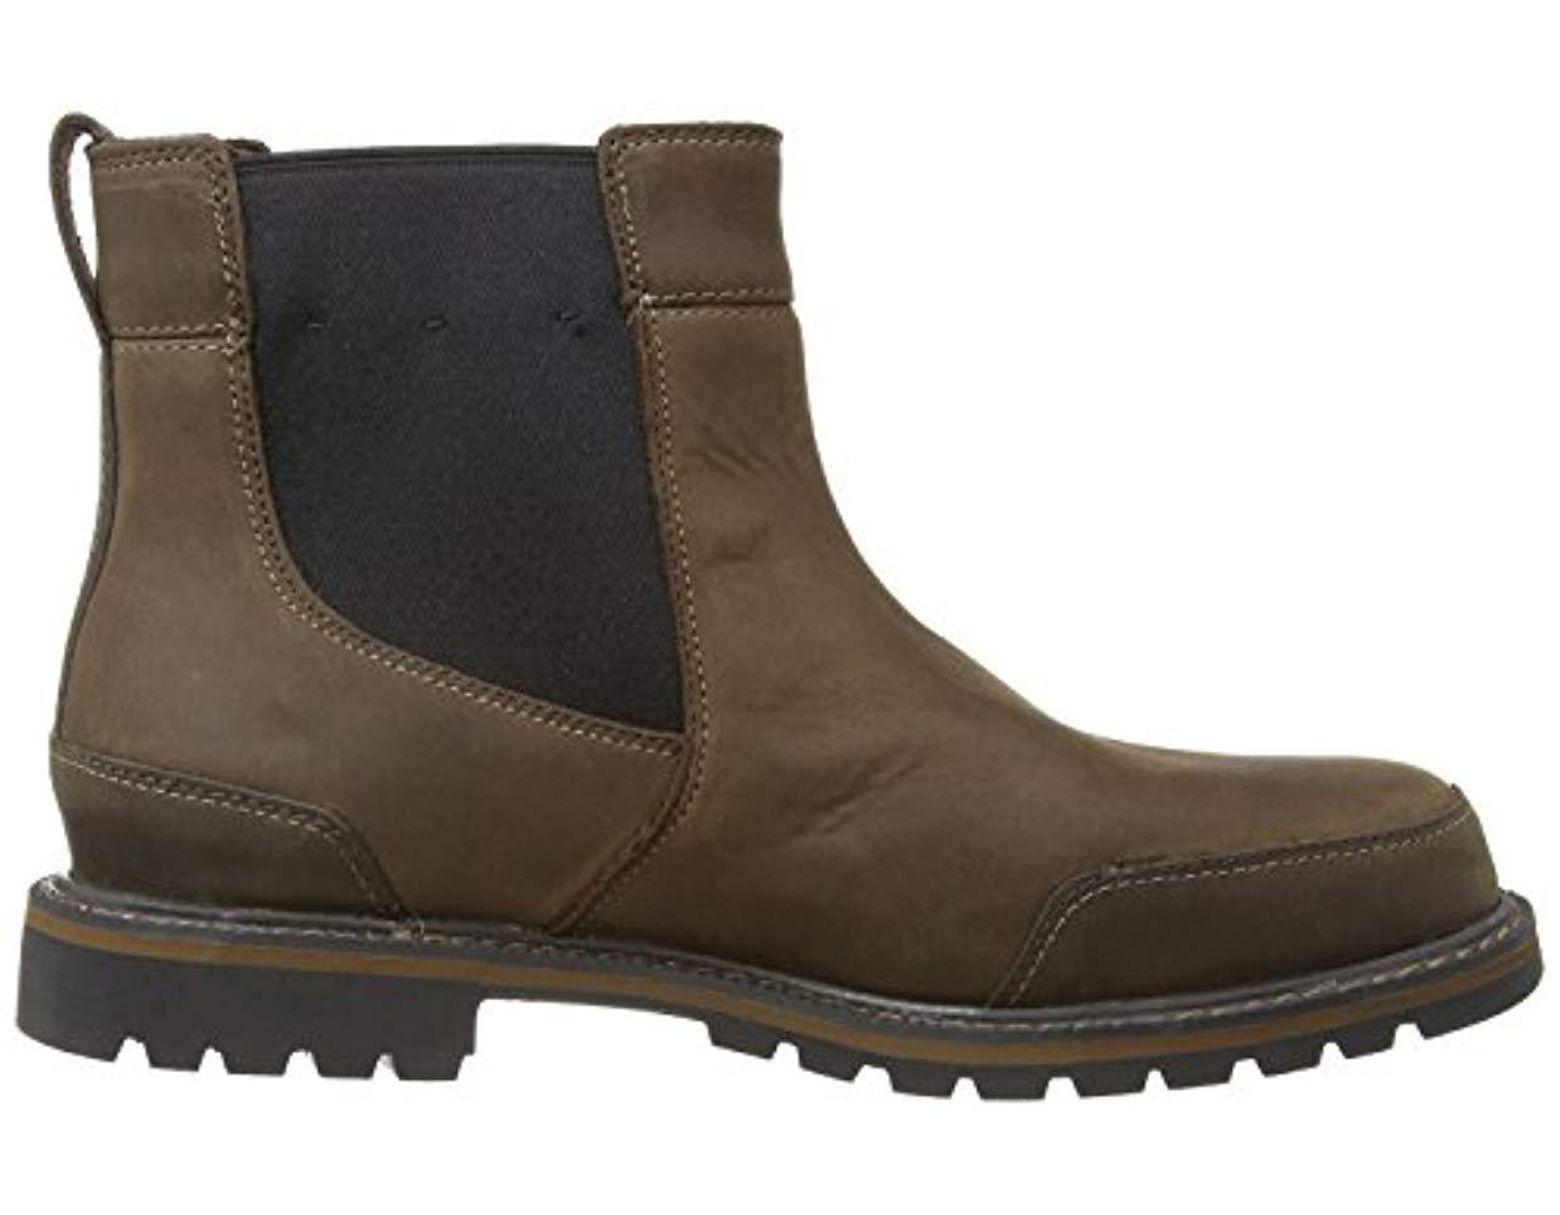 Timberland Ek Chestnut Ridge Ftm_chelsea, S Boots in Brown